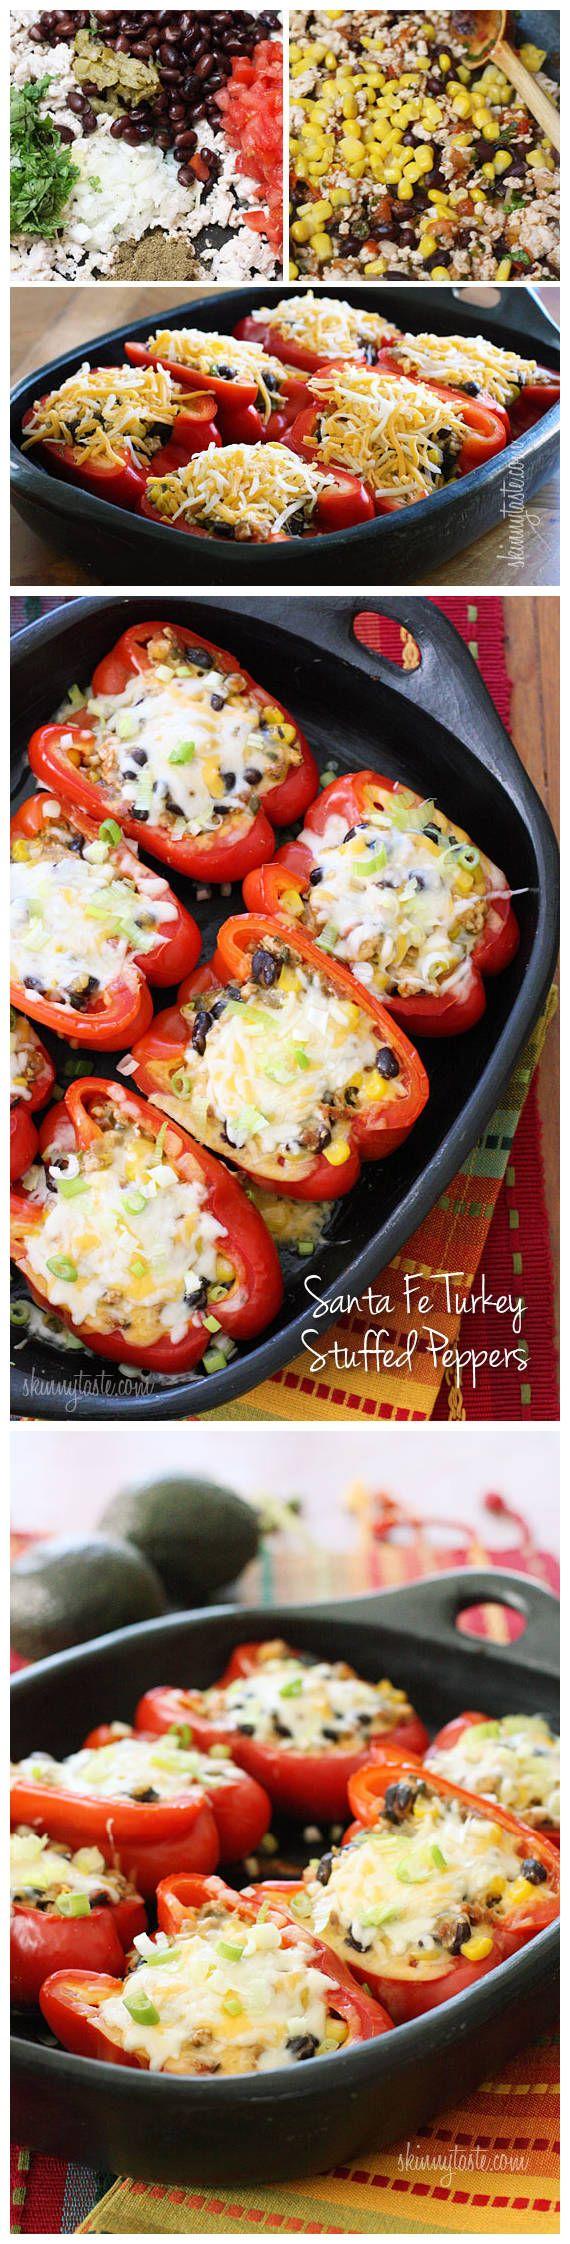 Santa Fe Turkey Stuffed Peppers | Favorite Food Bloggers! | Pinterest